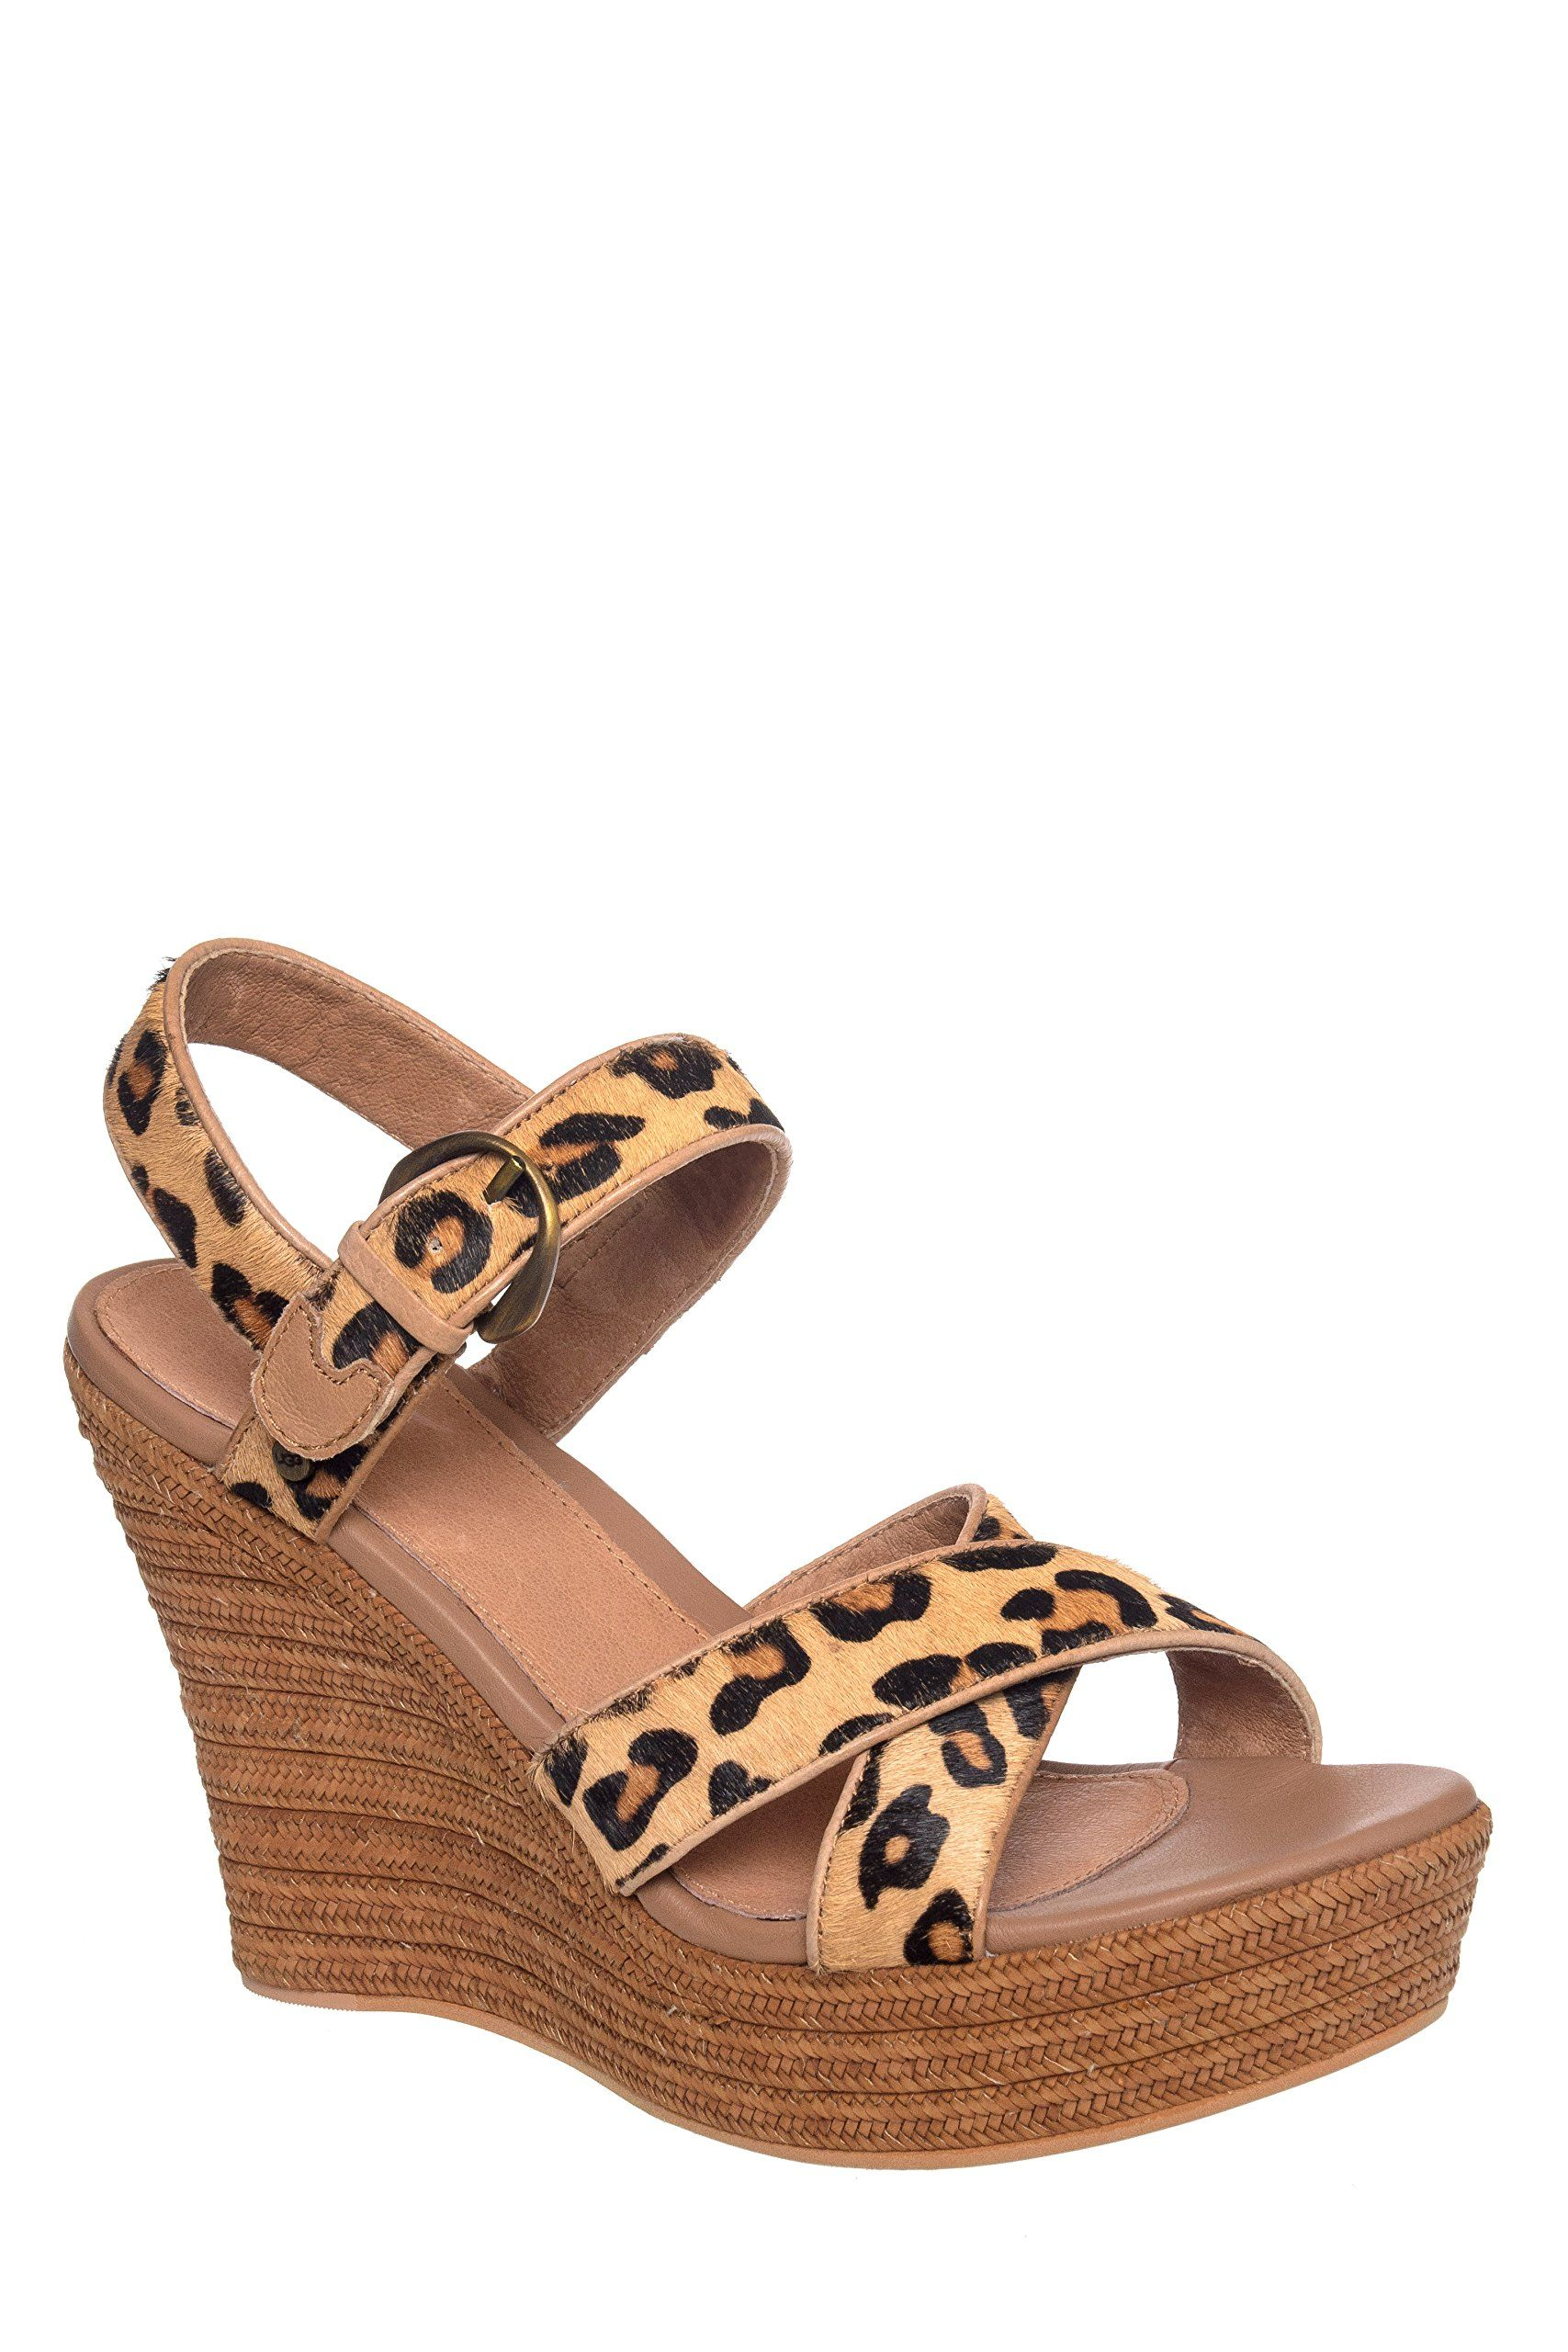 0debe371aea UGG Australia Womens Jazmine Calf Hair Leopard Chestnut Leopard Wedge - 9.  leather. animal-print. rubber-sole. open-toe. ankle-strap.